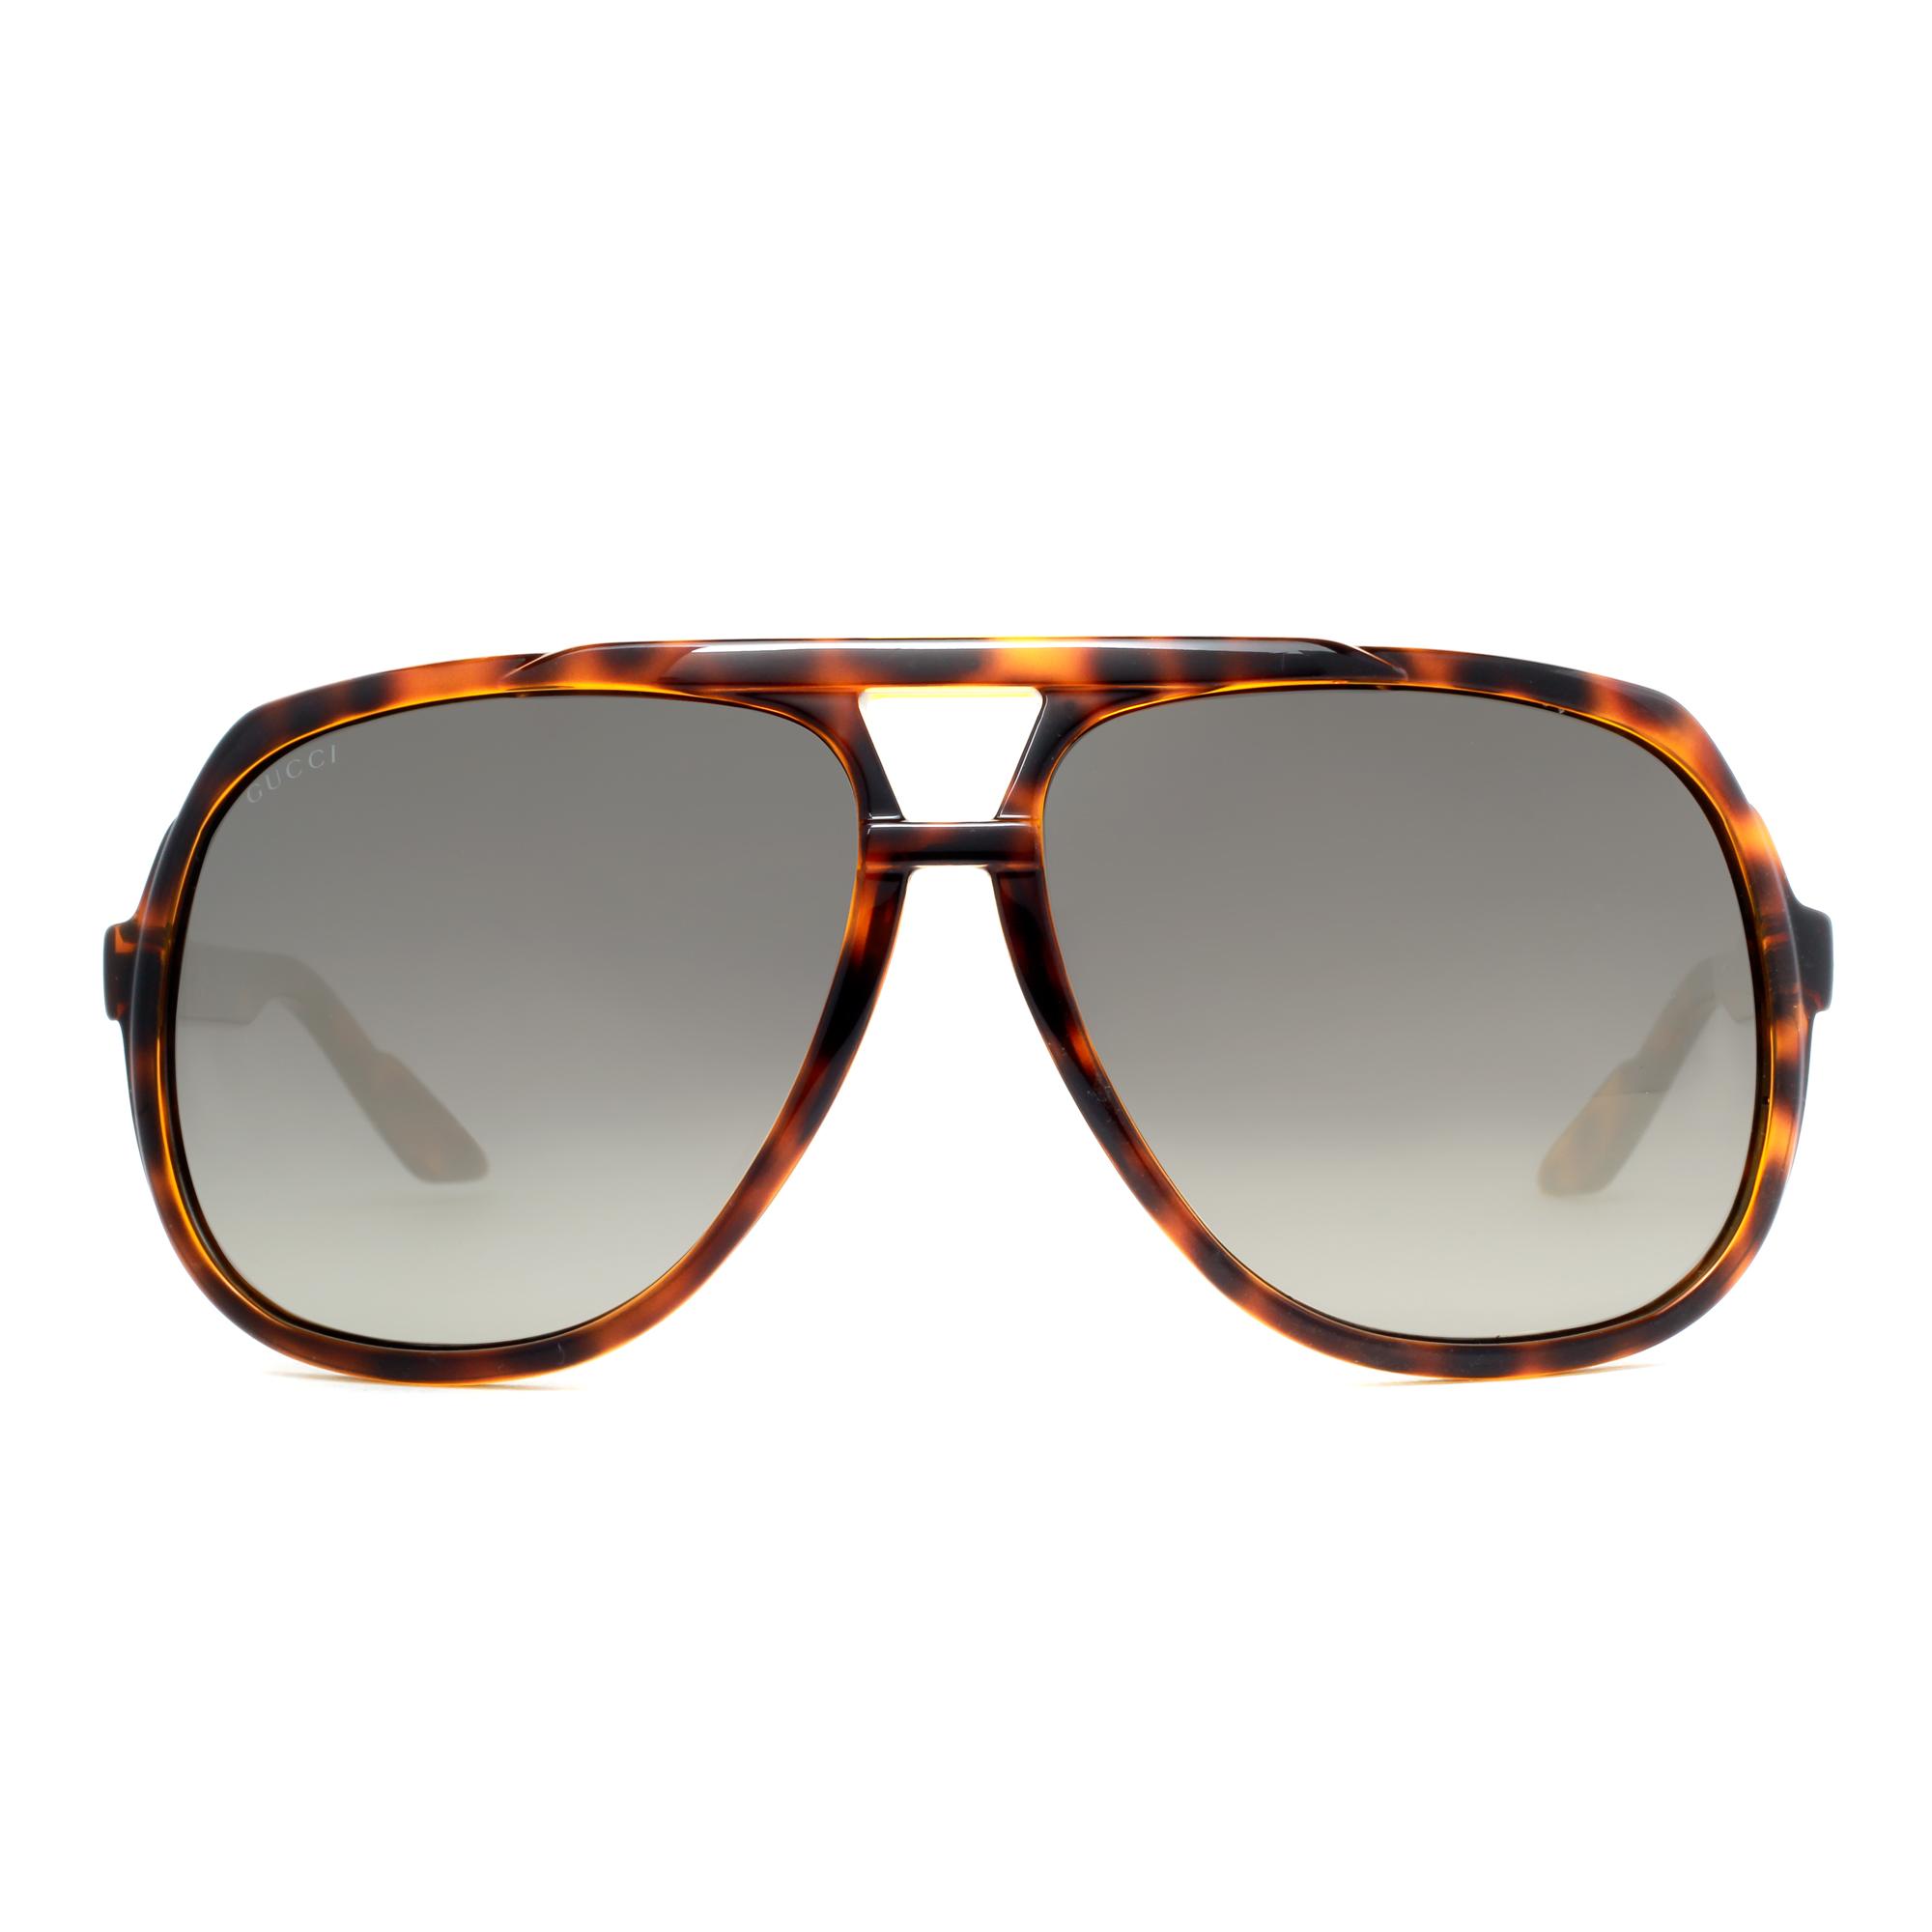 1bf0b2f6971 Gucci Oversized Sunglasses Ebay